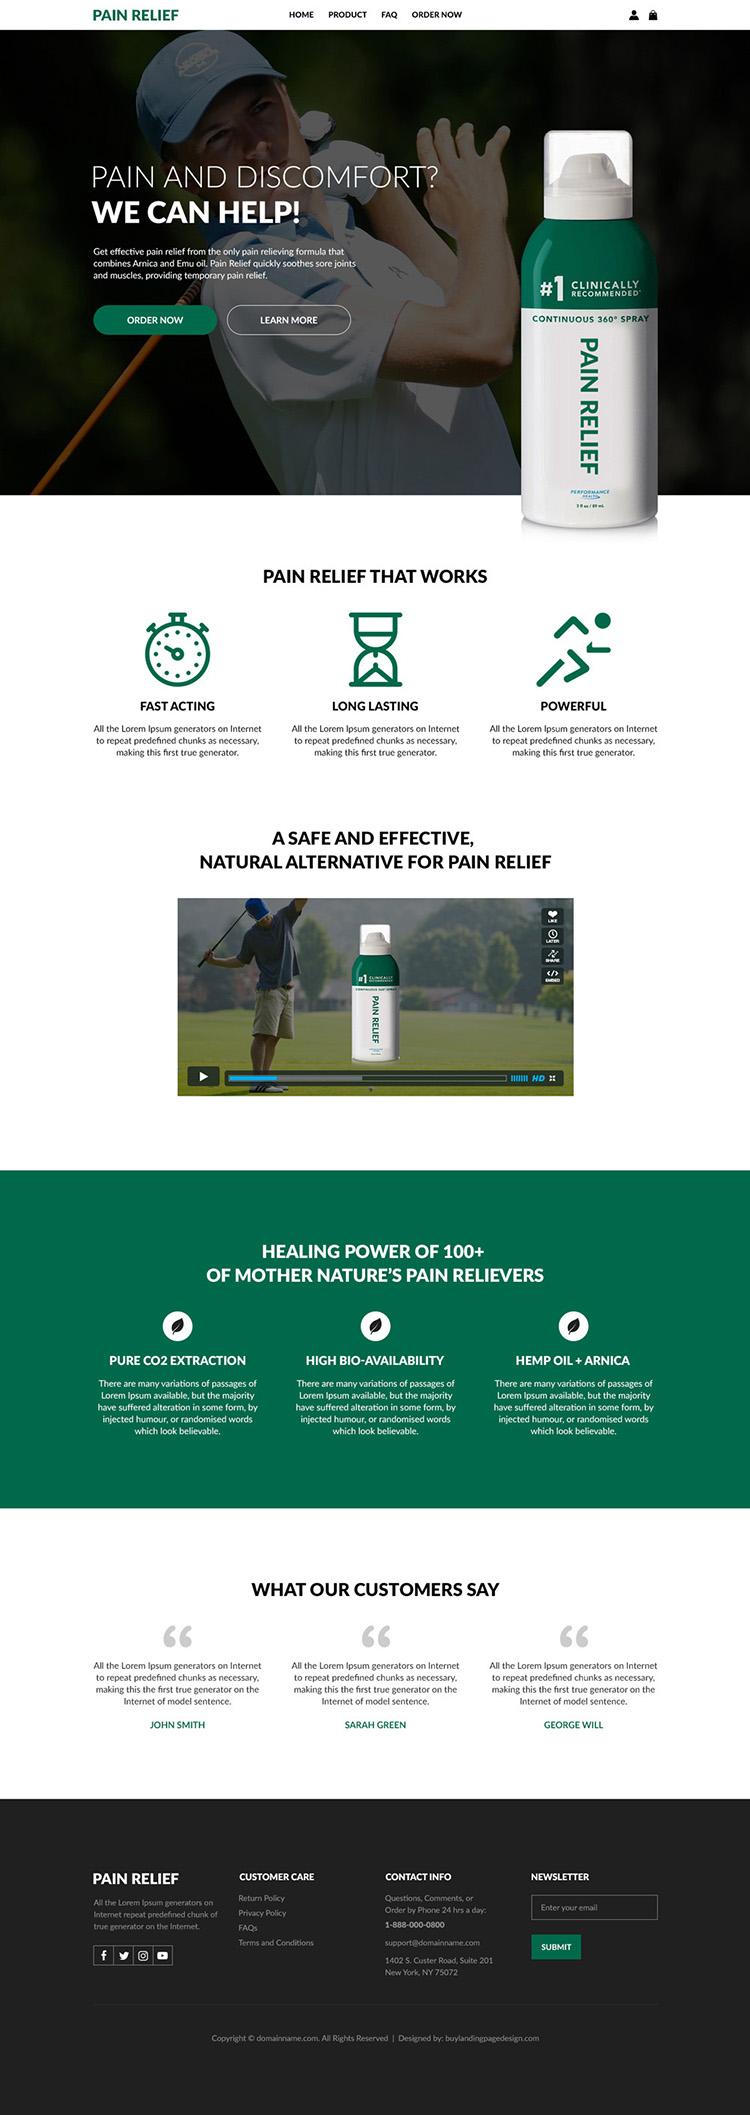 pain relief spray lead generating responsive website design